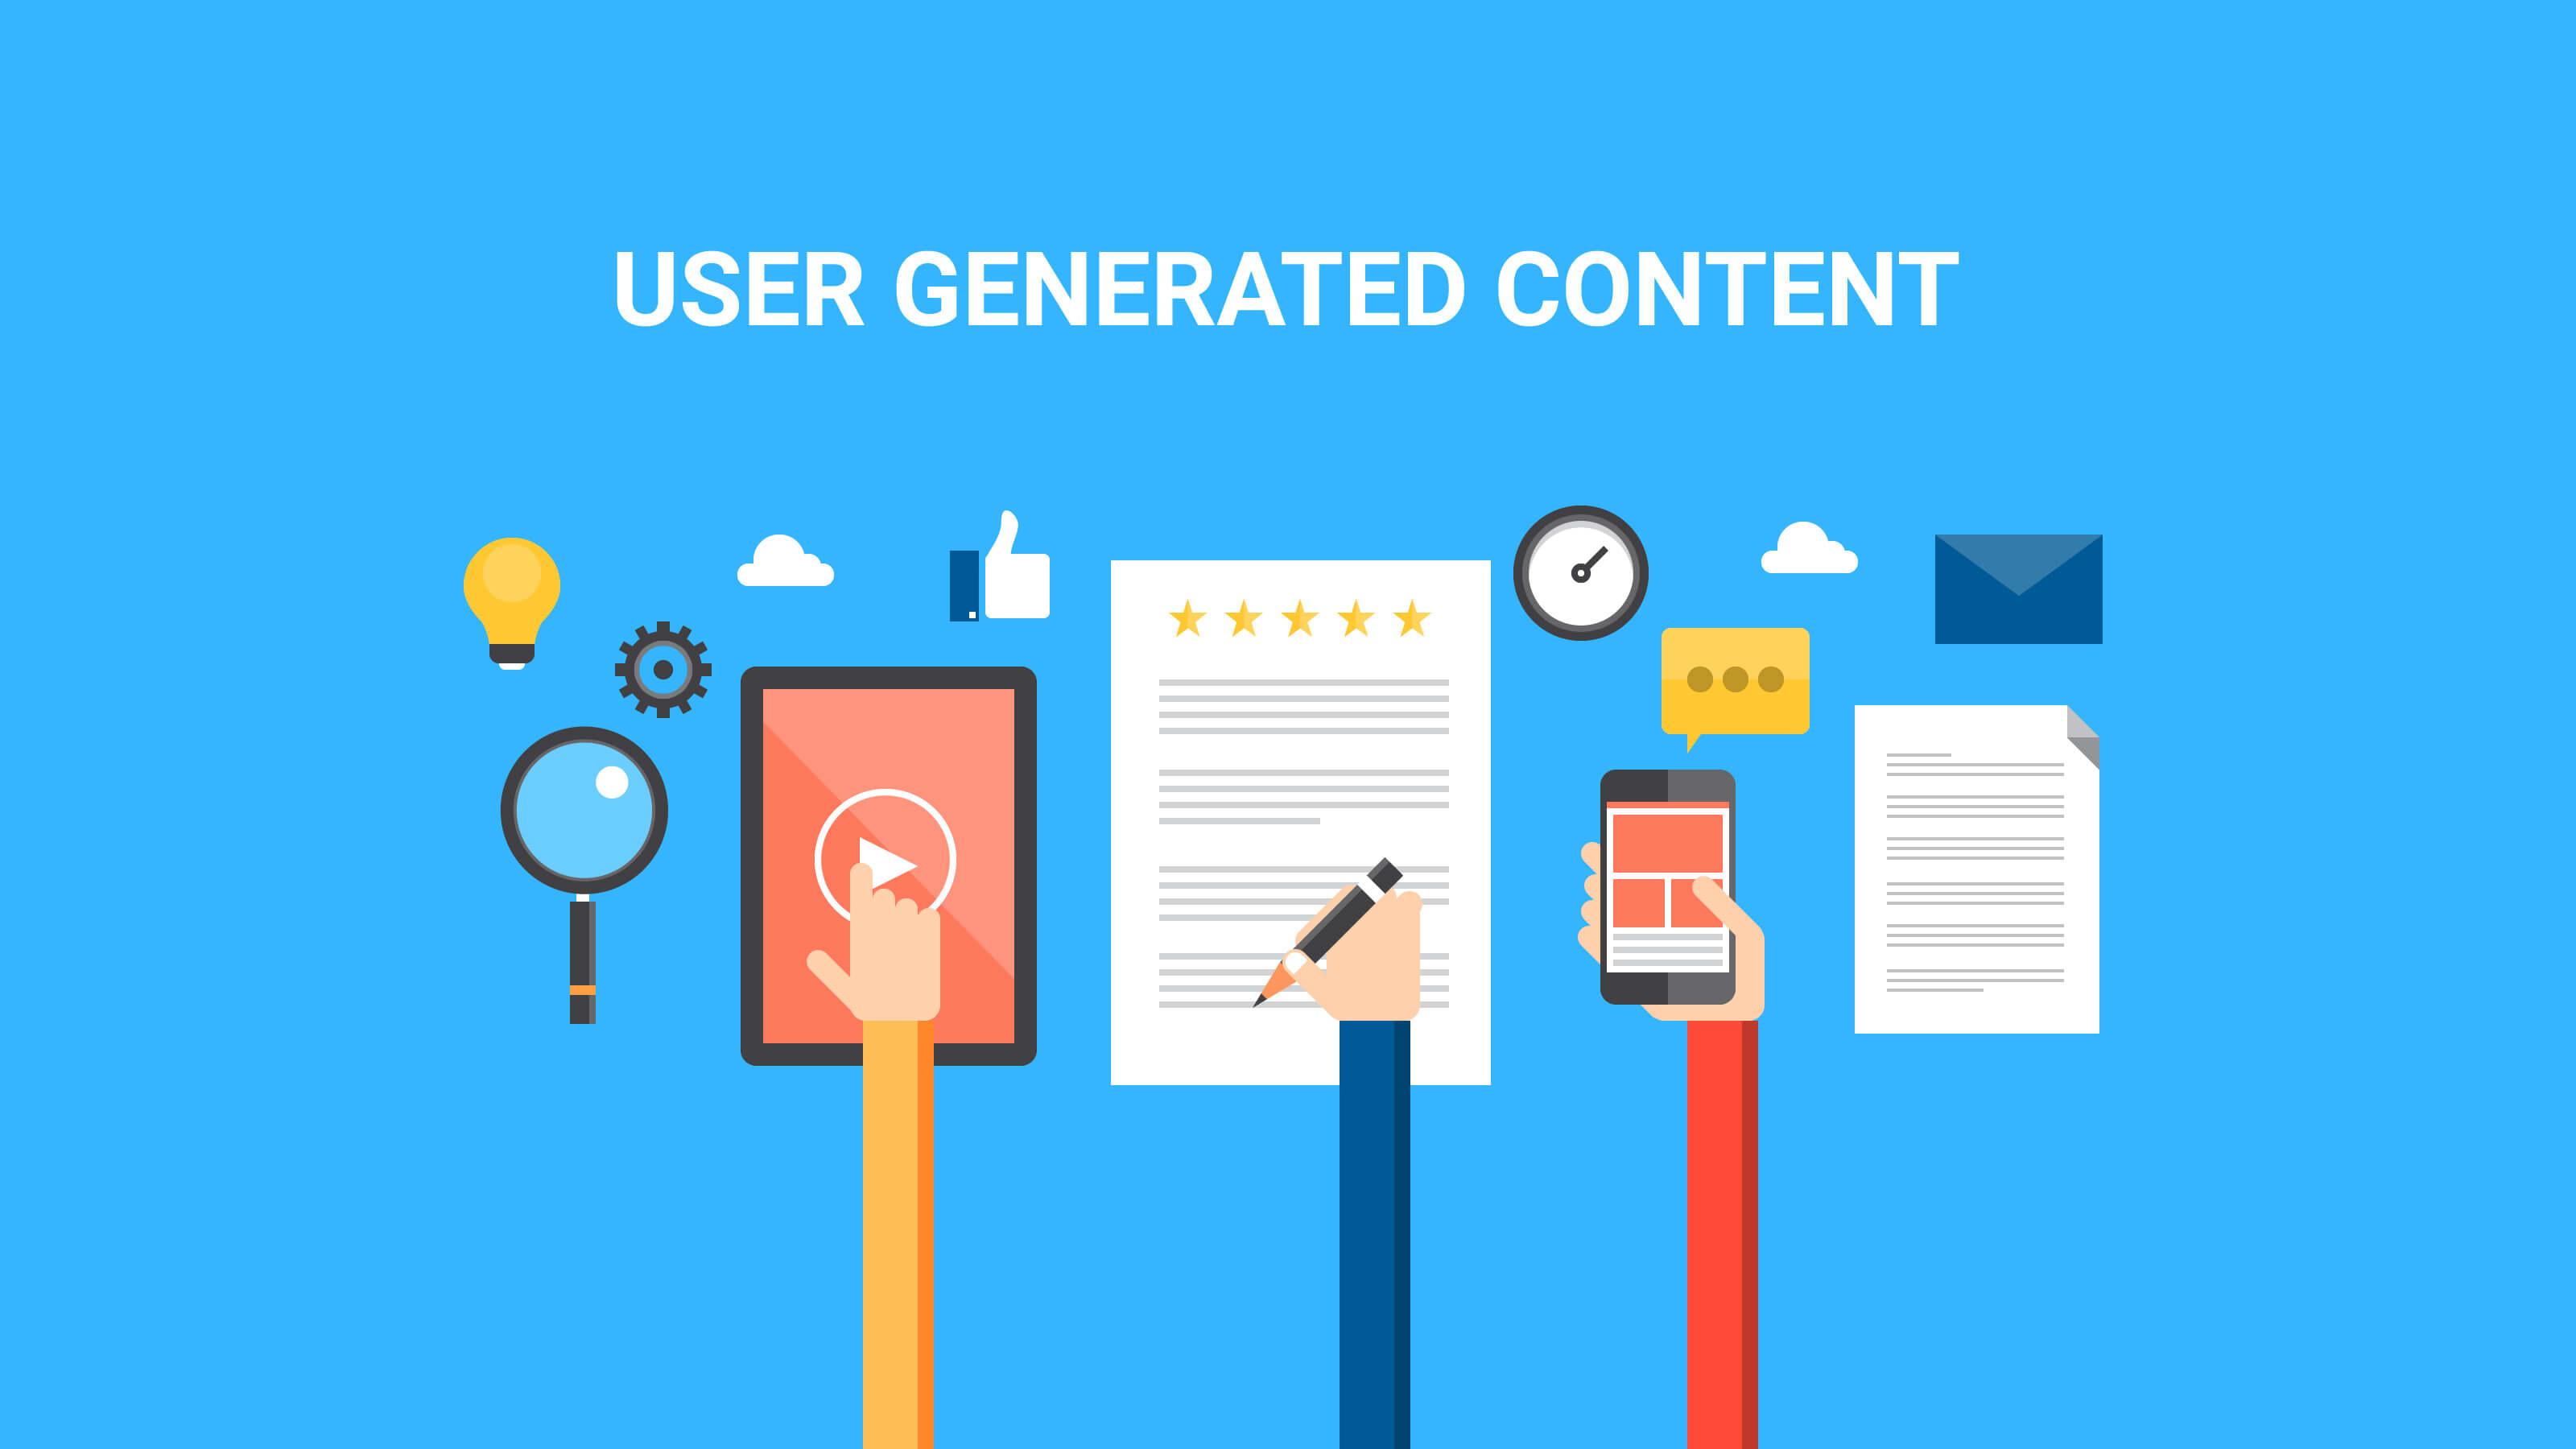 UGC (User Generated Content)